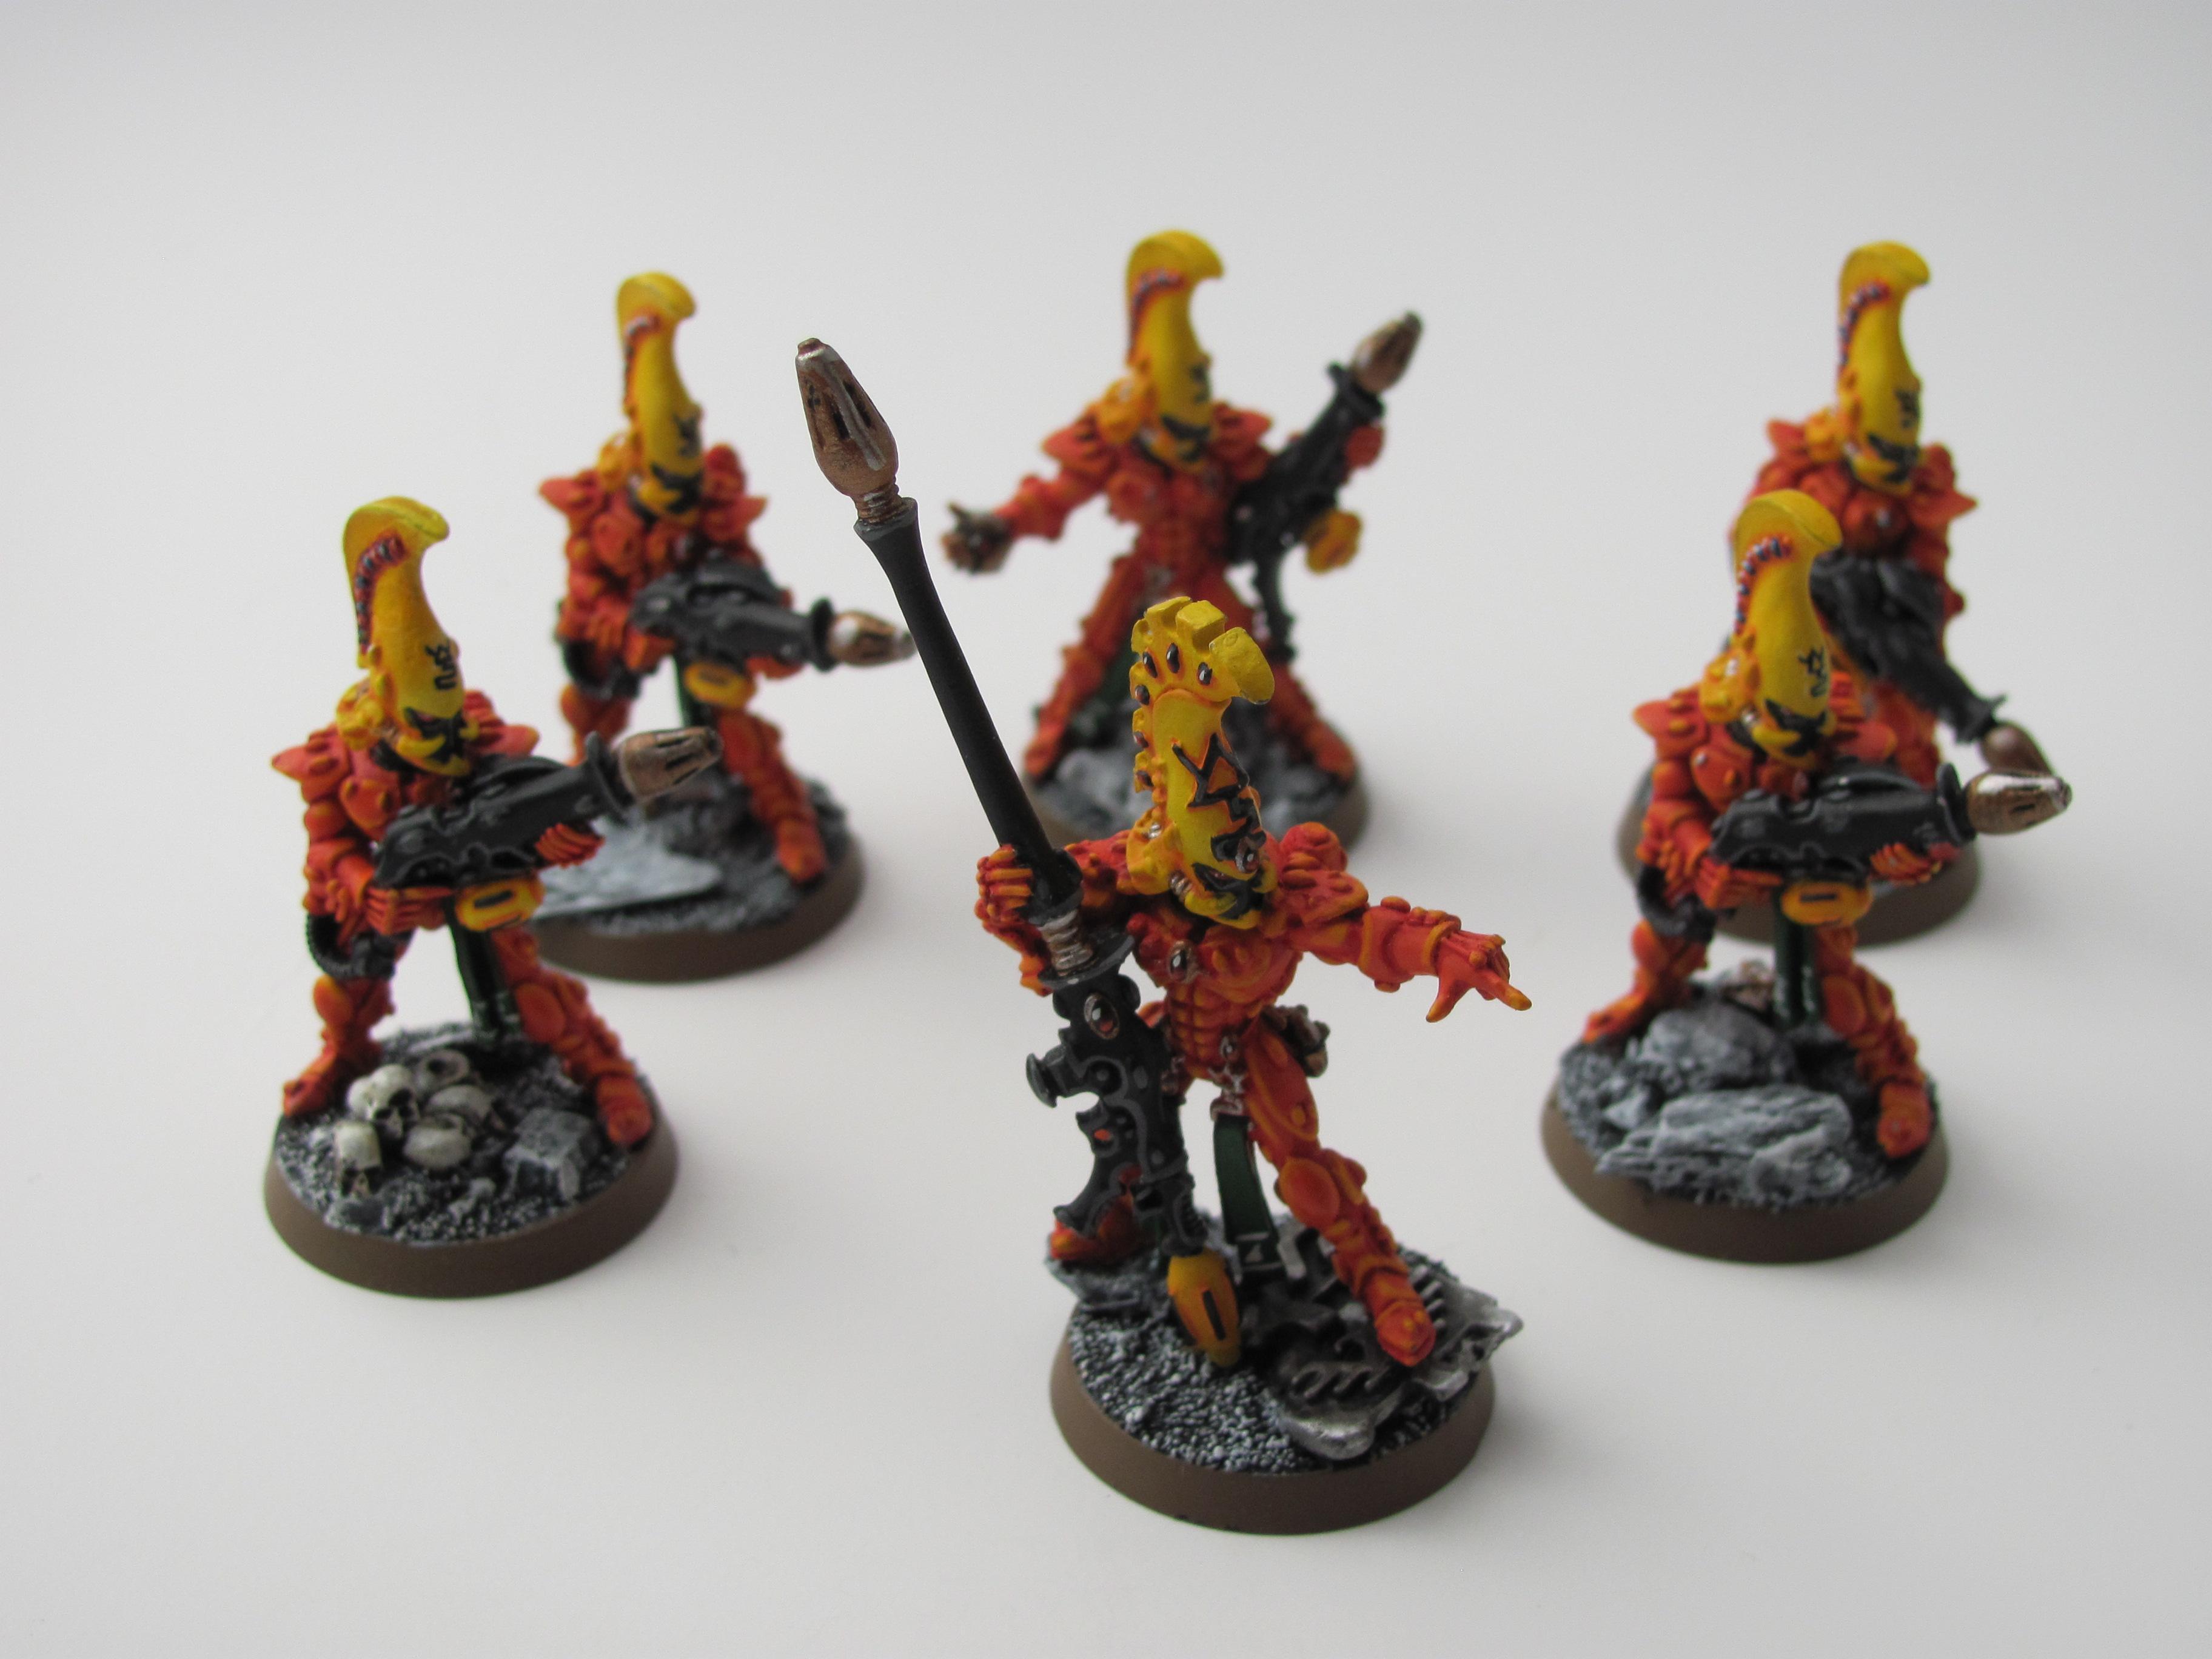 Biel-tan, Eldar, Fire Dragon, Warhammer 40,000